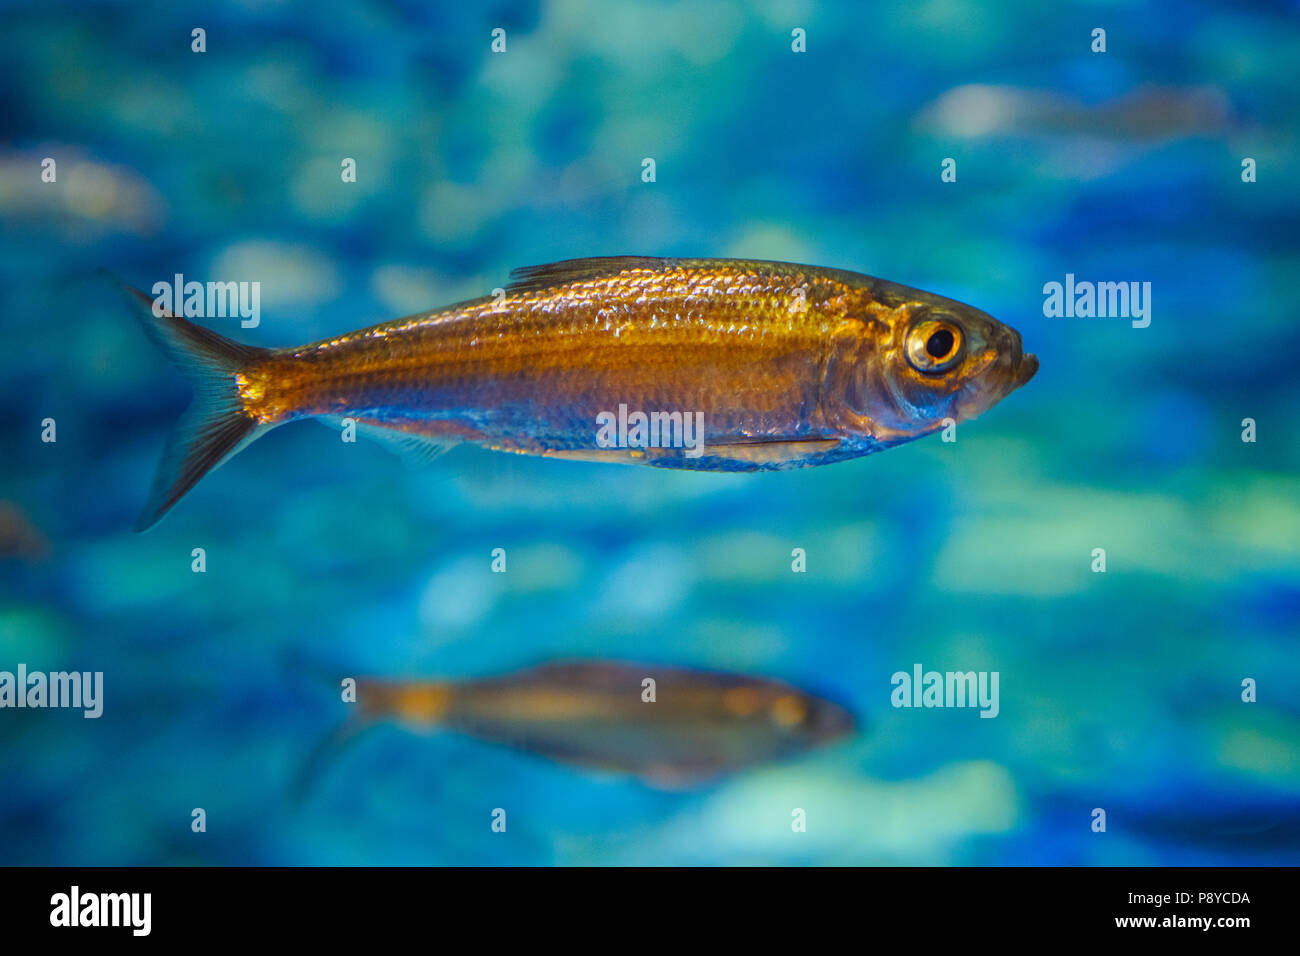 Un pequeño mar océano amarillo peces tropicales de agua azul, el colorido mundo submarino, copyspace para texto, fondo de pantalla Foto de stock